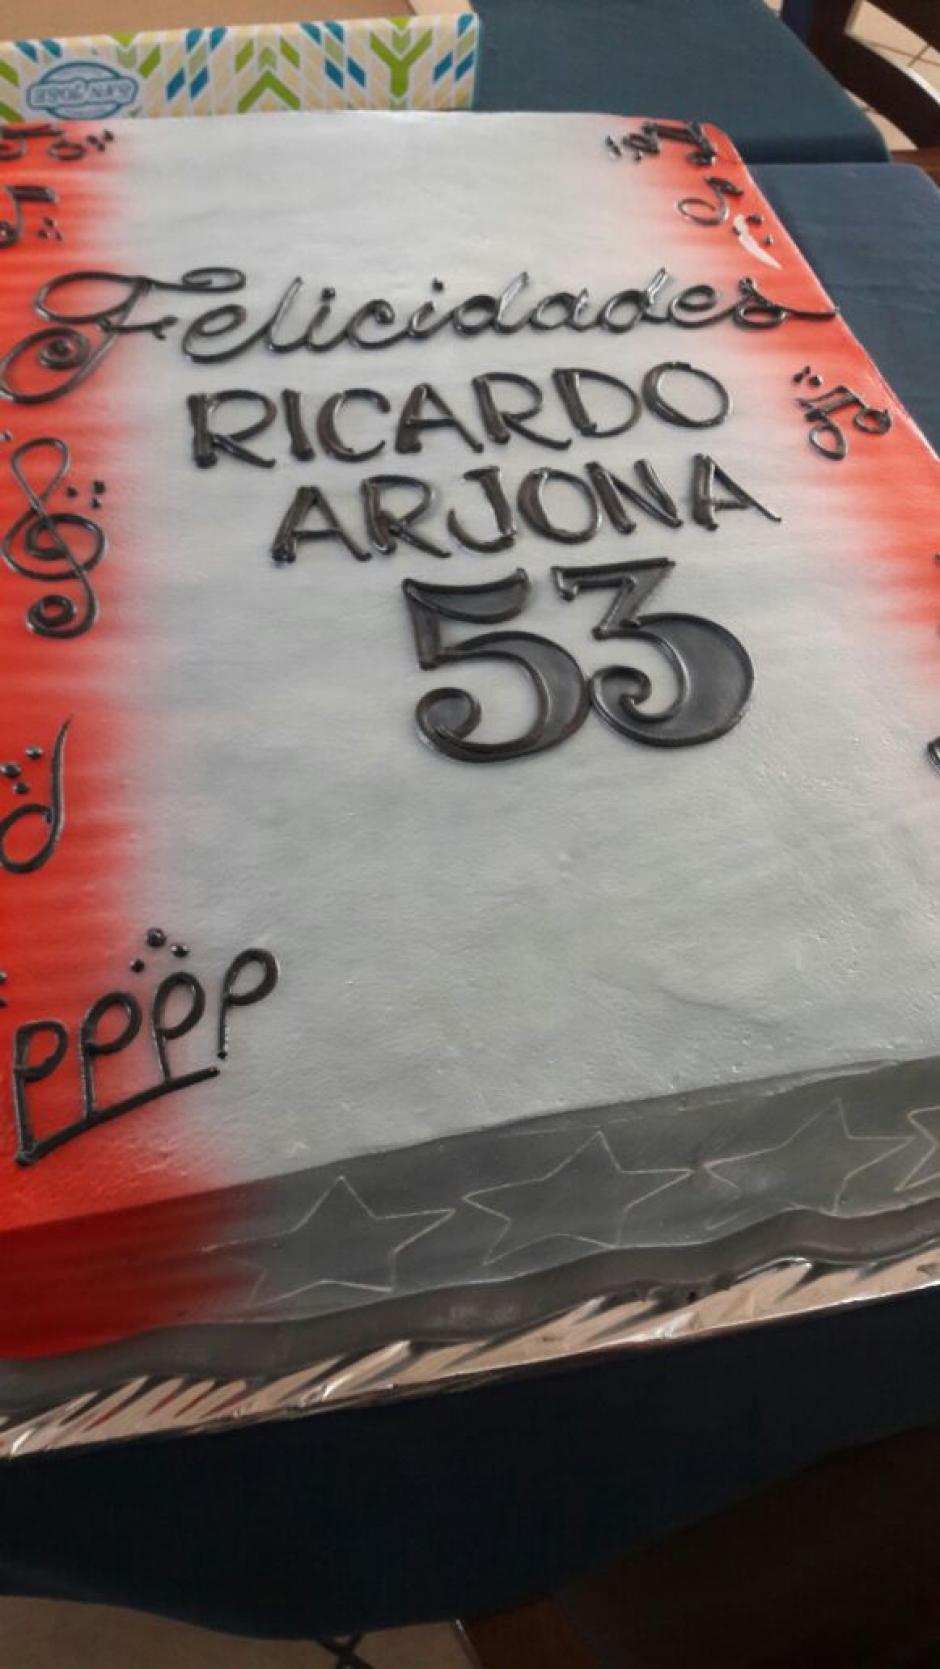 Ricardo Arjona nació el 19 de enero de 1964. (Foto: Twitter)